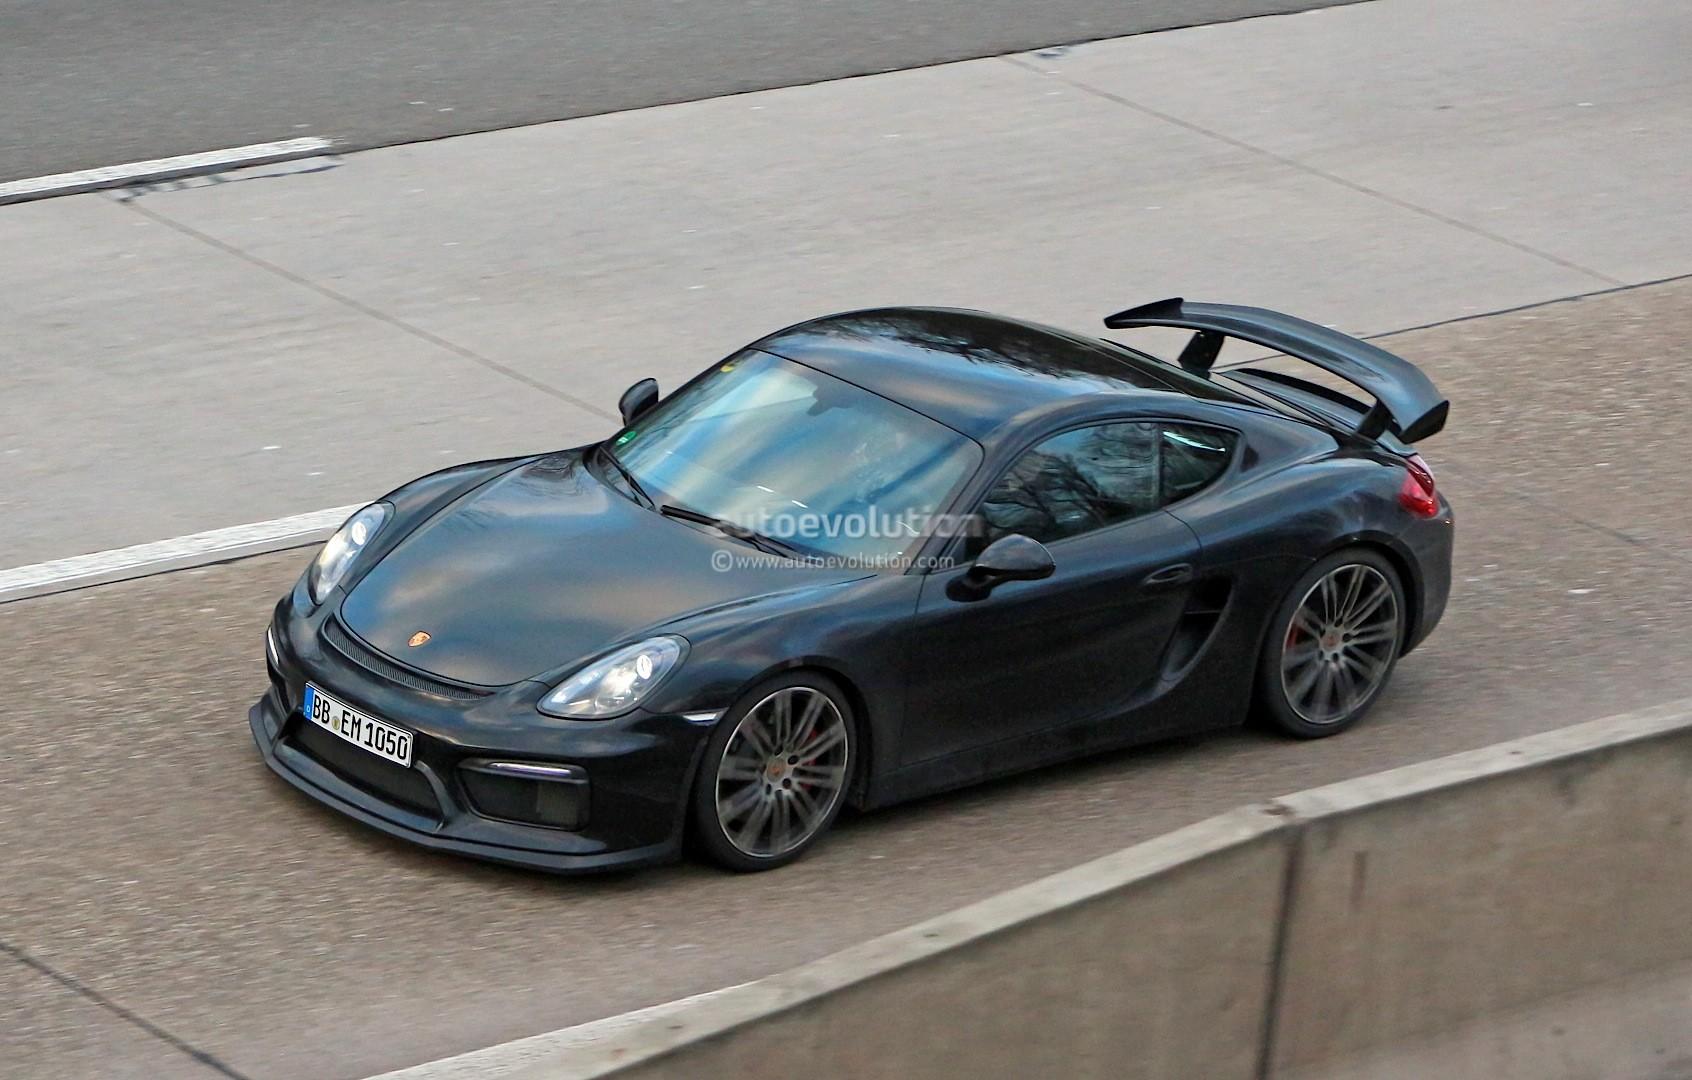 2015 porsche cayman gt4 completely revealed in latest spy photos gets production wing autoevolution - Porsche Cayman 2015 Gt4